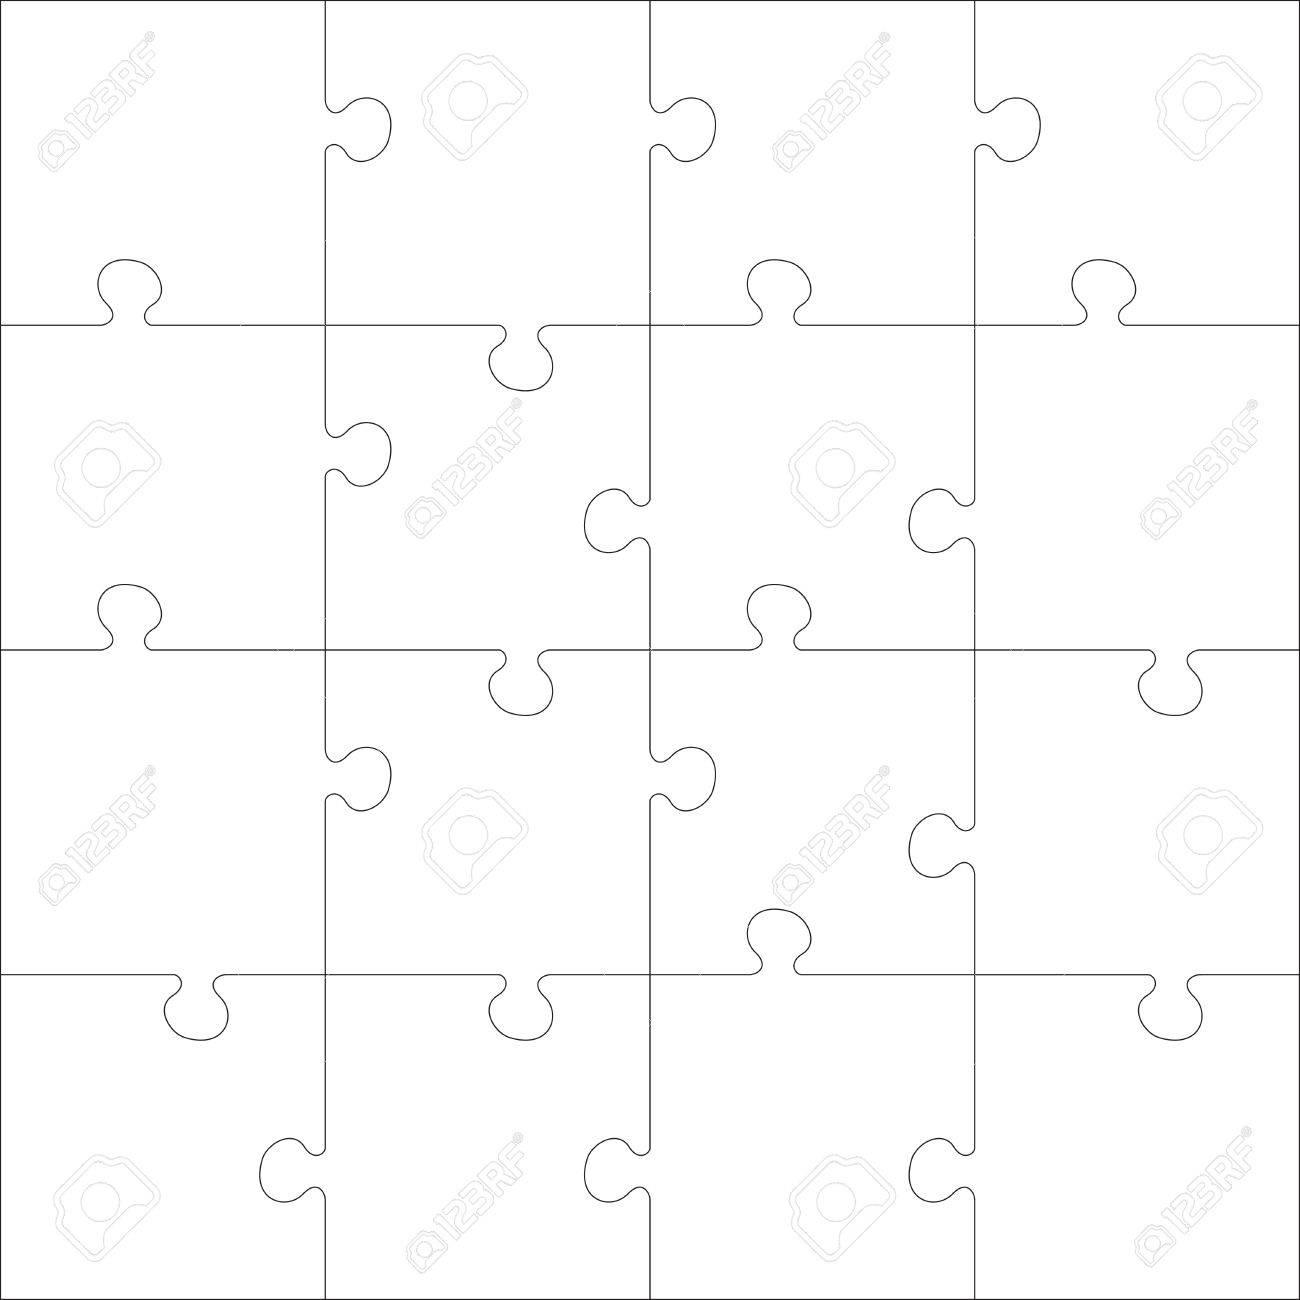 White Jigsaw Puzzle Every Piece Is A Single Shape Seamless